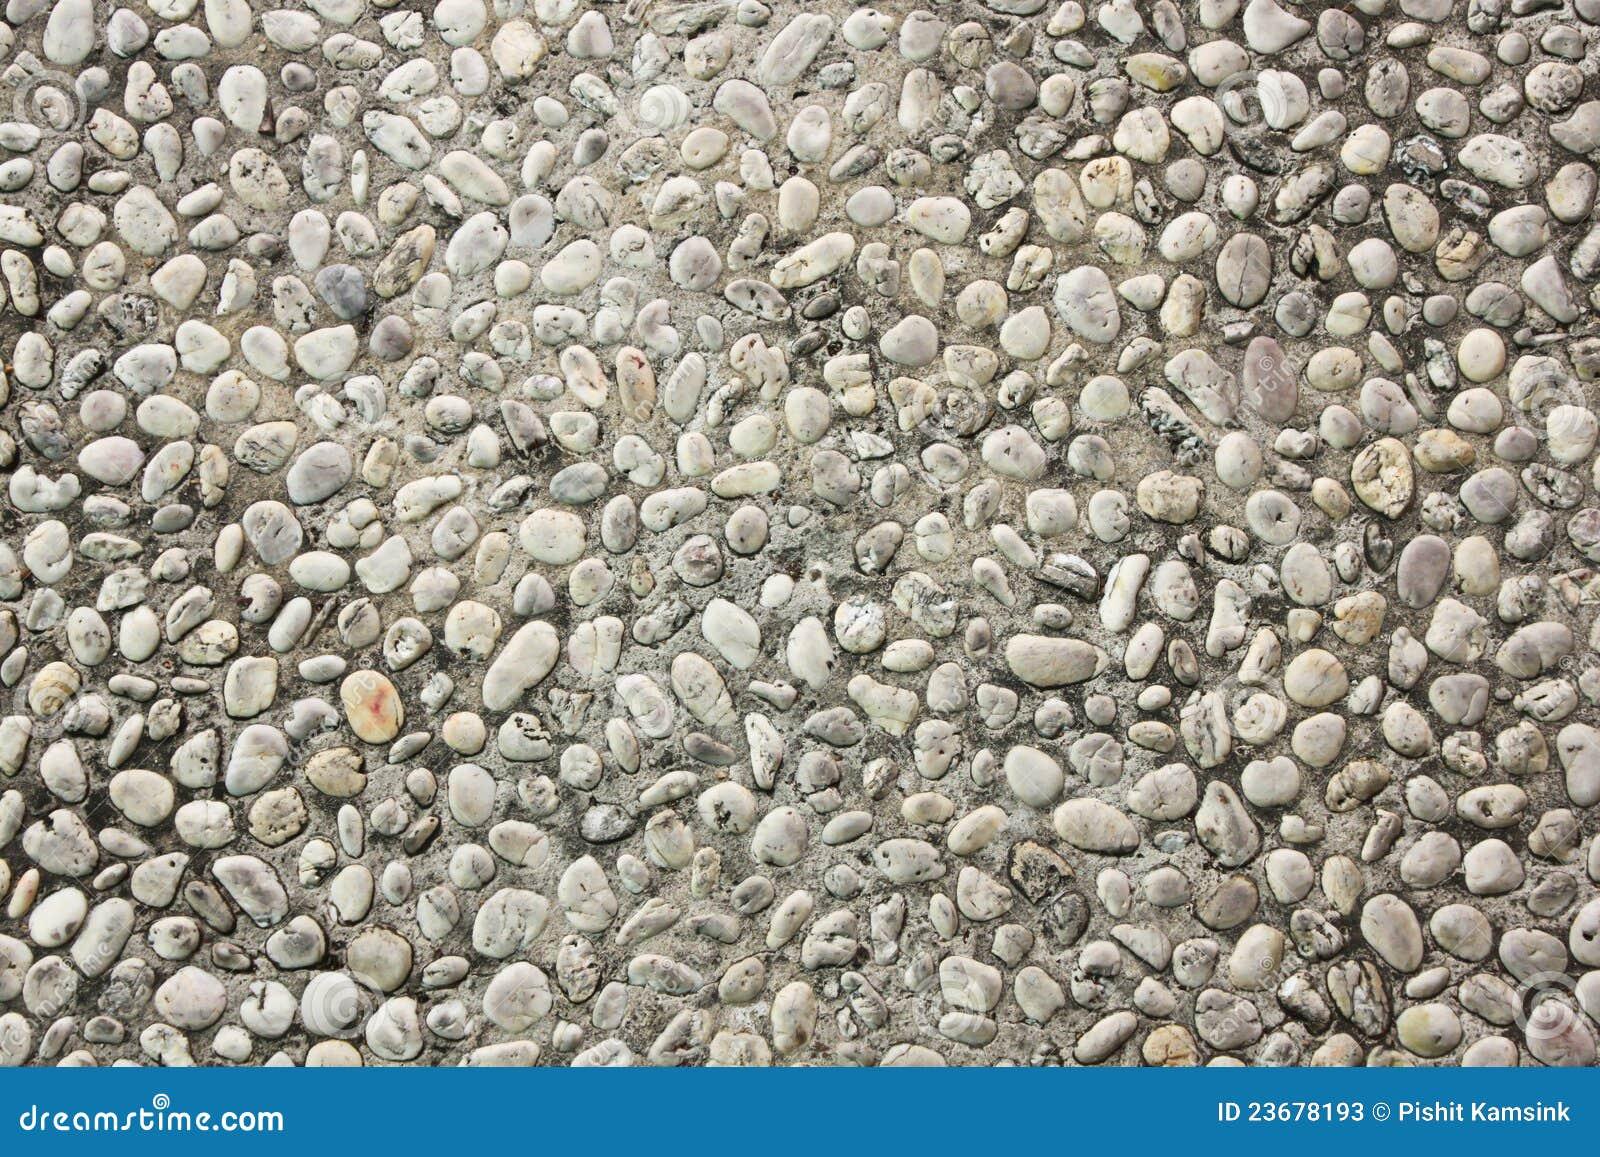 Floor stone texture stock photos image 23678193 - Suelo de piedra ...